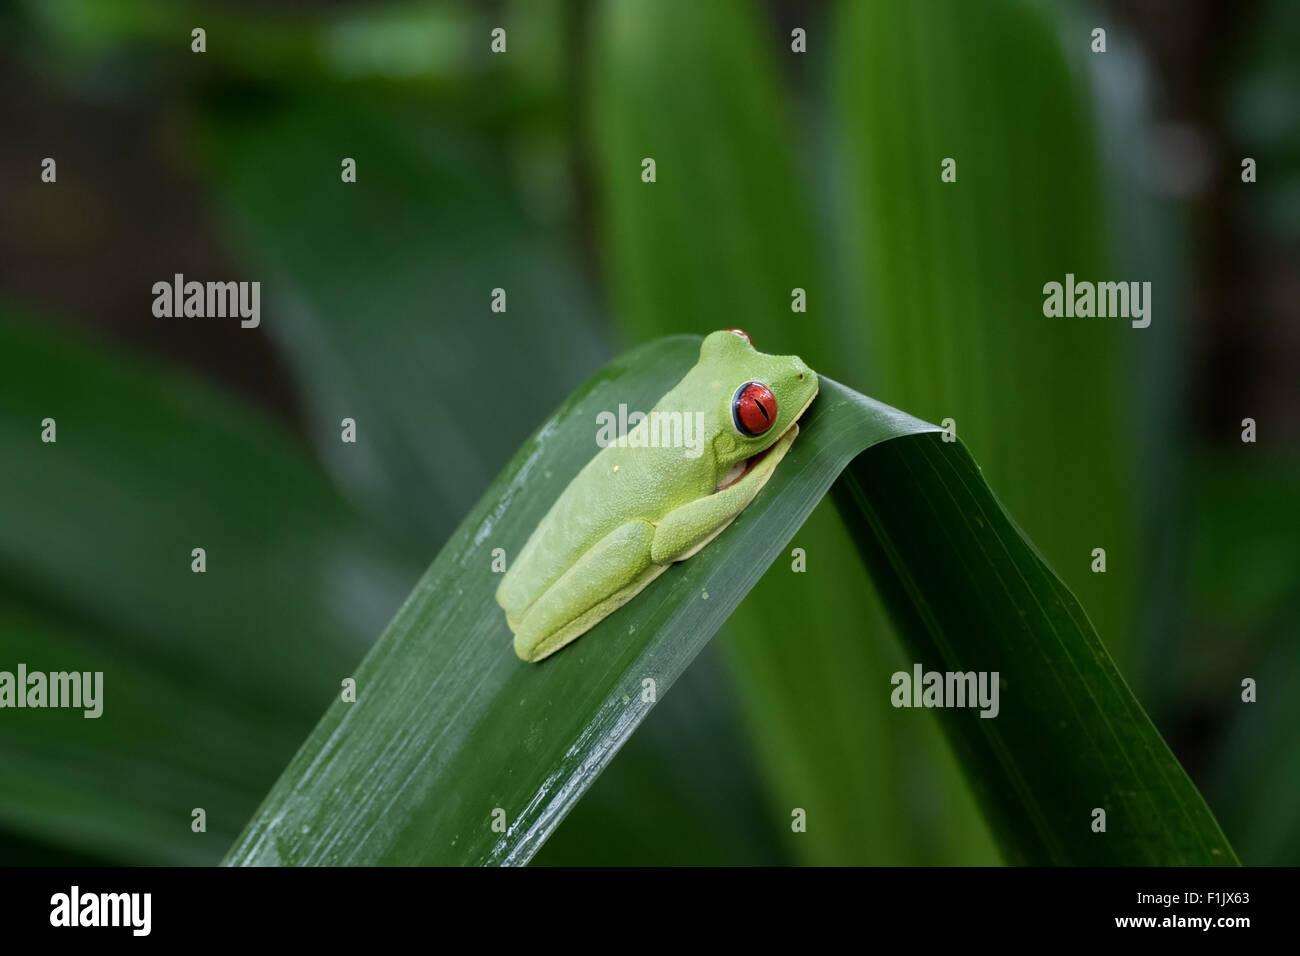 Red-eyed tree frog (Agalychnis callidryas) near Cahuita National Park, Costa Rica. Wild animal, fauna, wildlife, - Stock Image